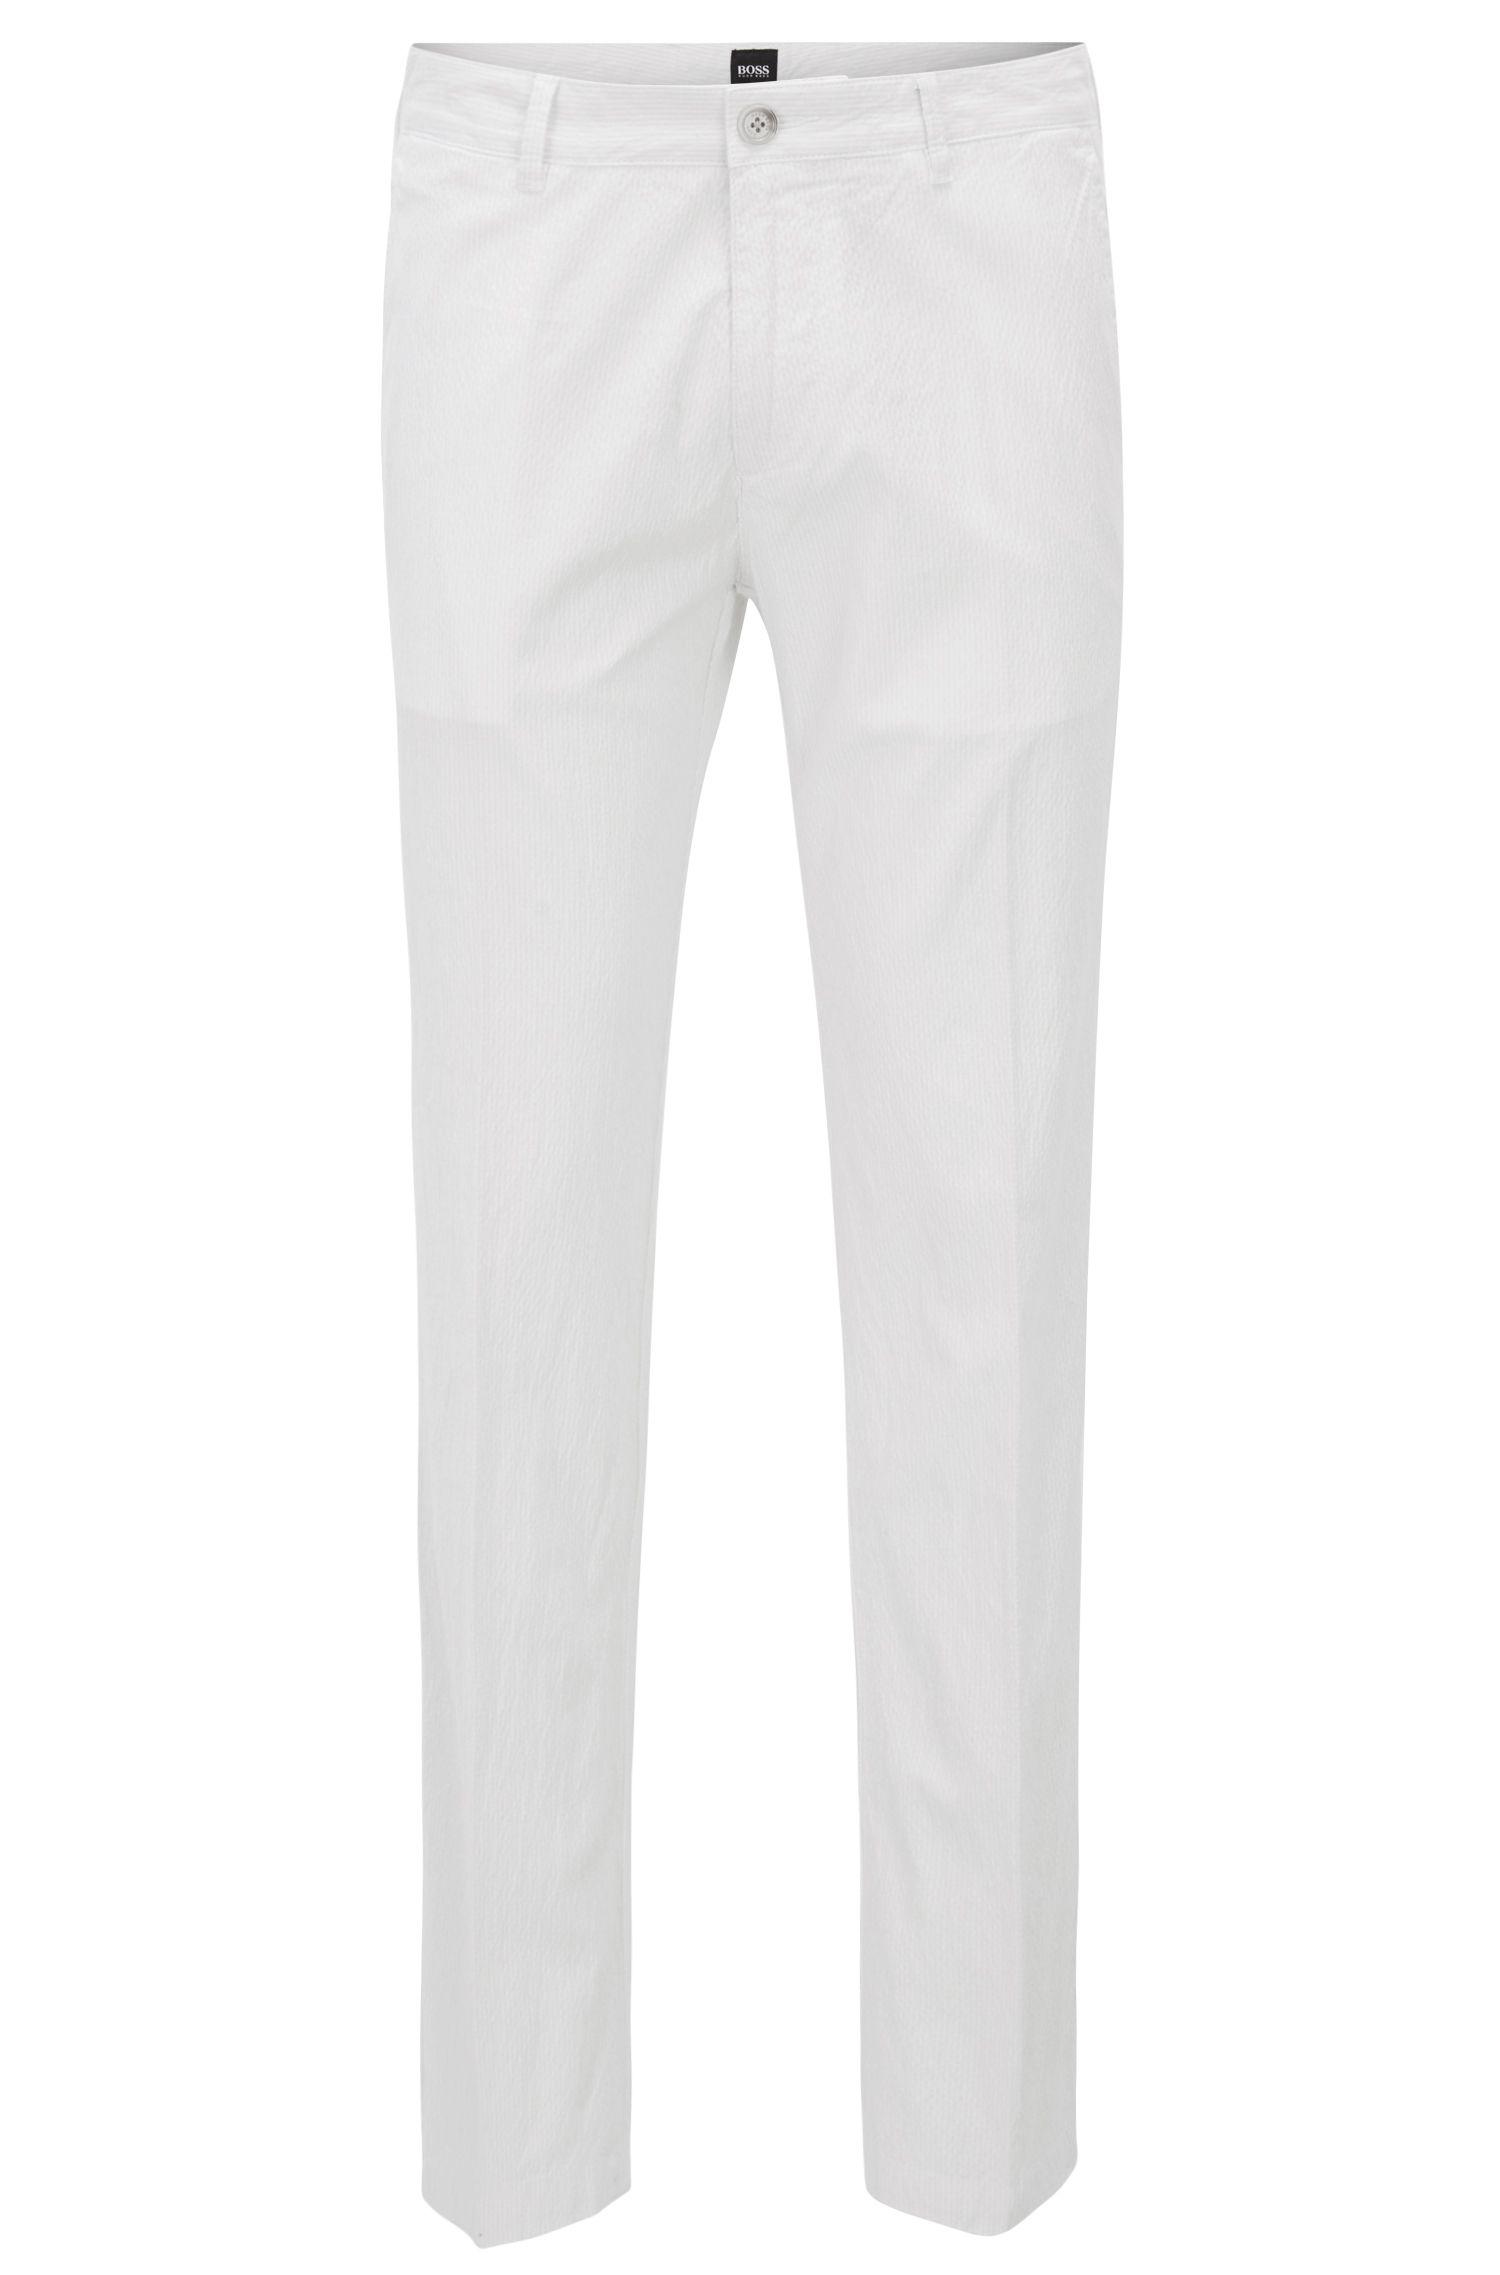 Stretch Cotton, Regular Fit | Crigan W